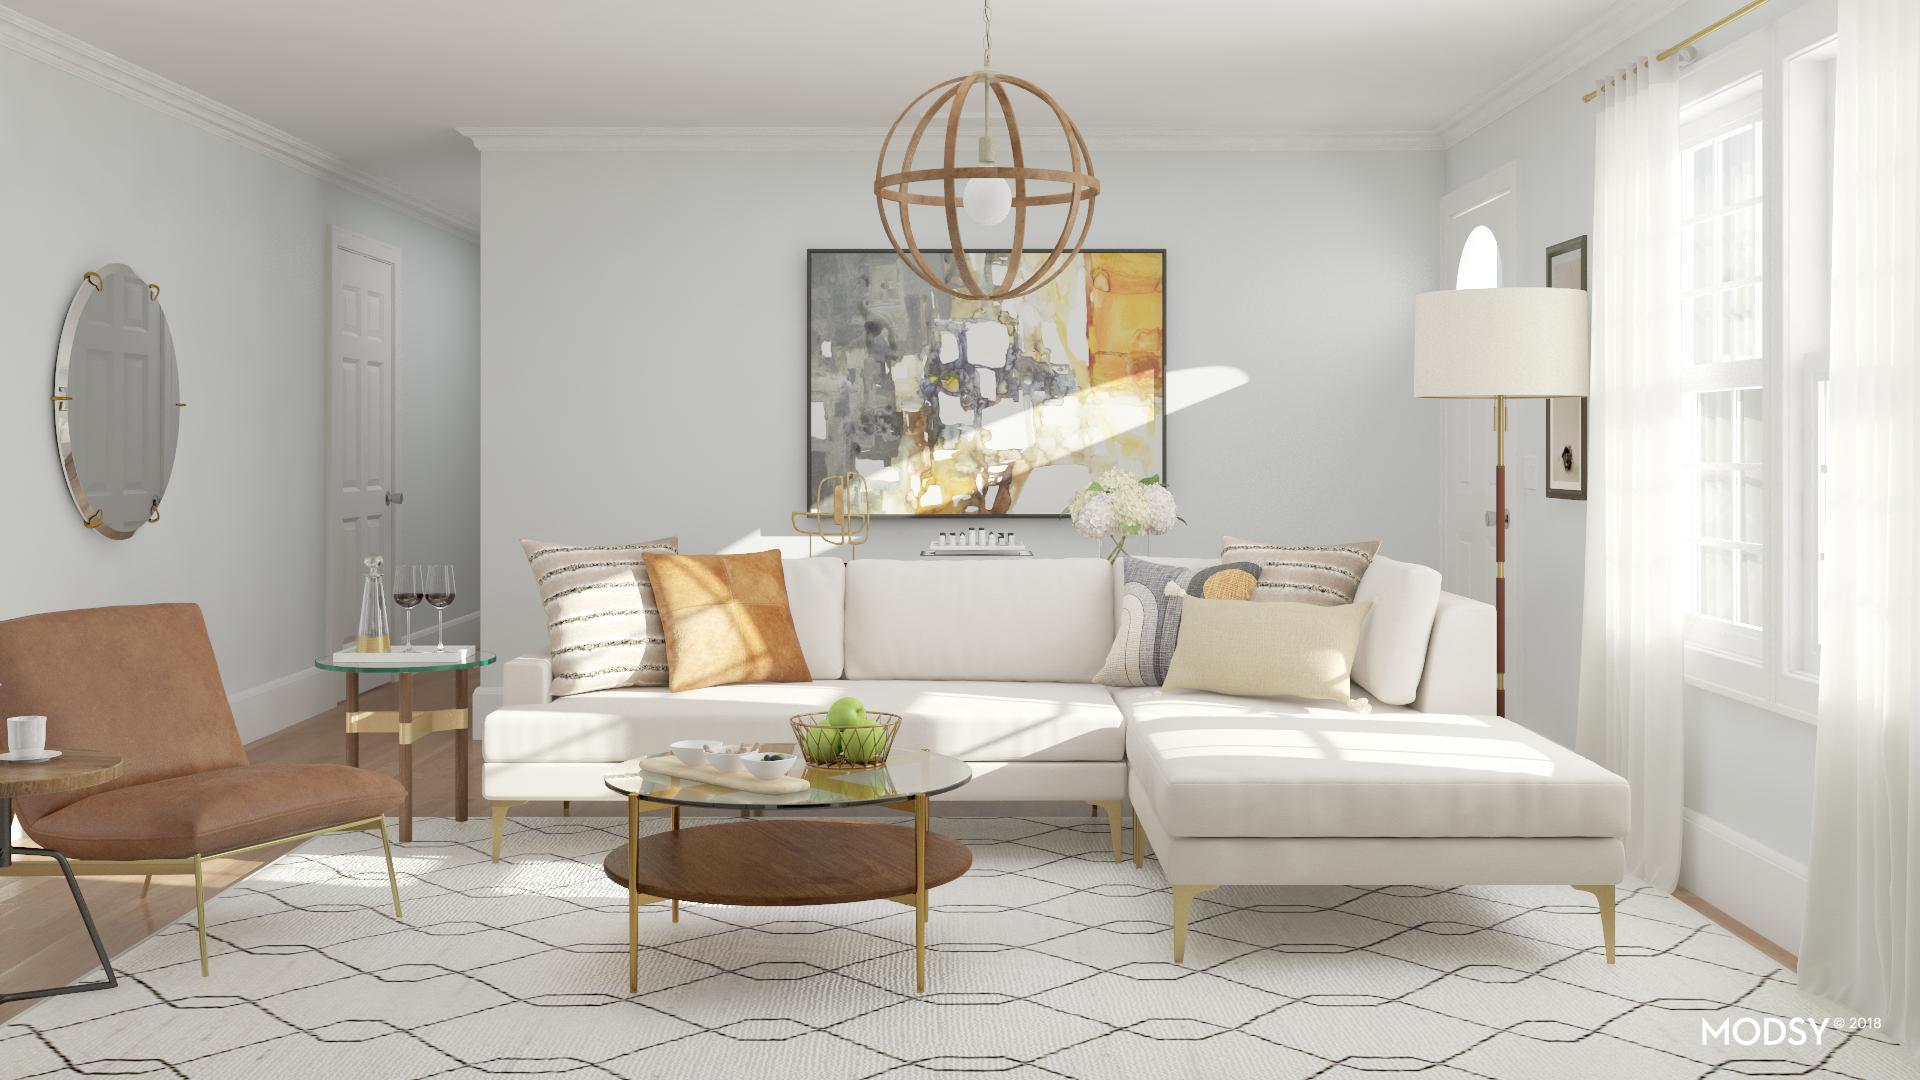 How To Arrange Furniture Like A Professional Interior Designer K T Designs Interior Design And Decor Blog Diy Projects